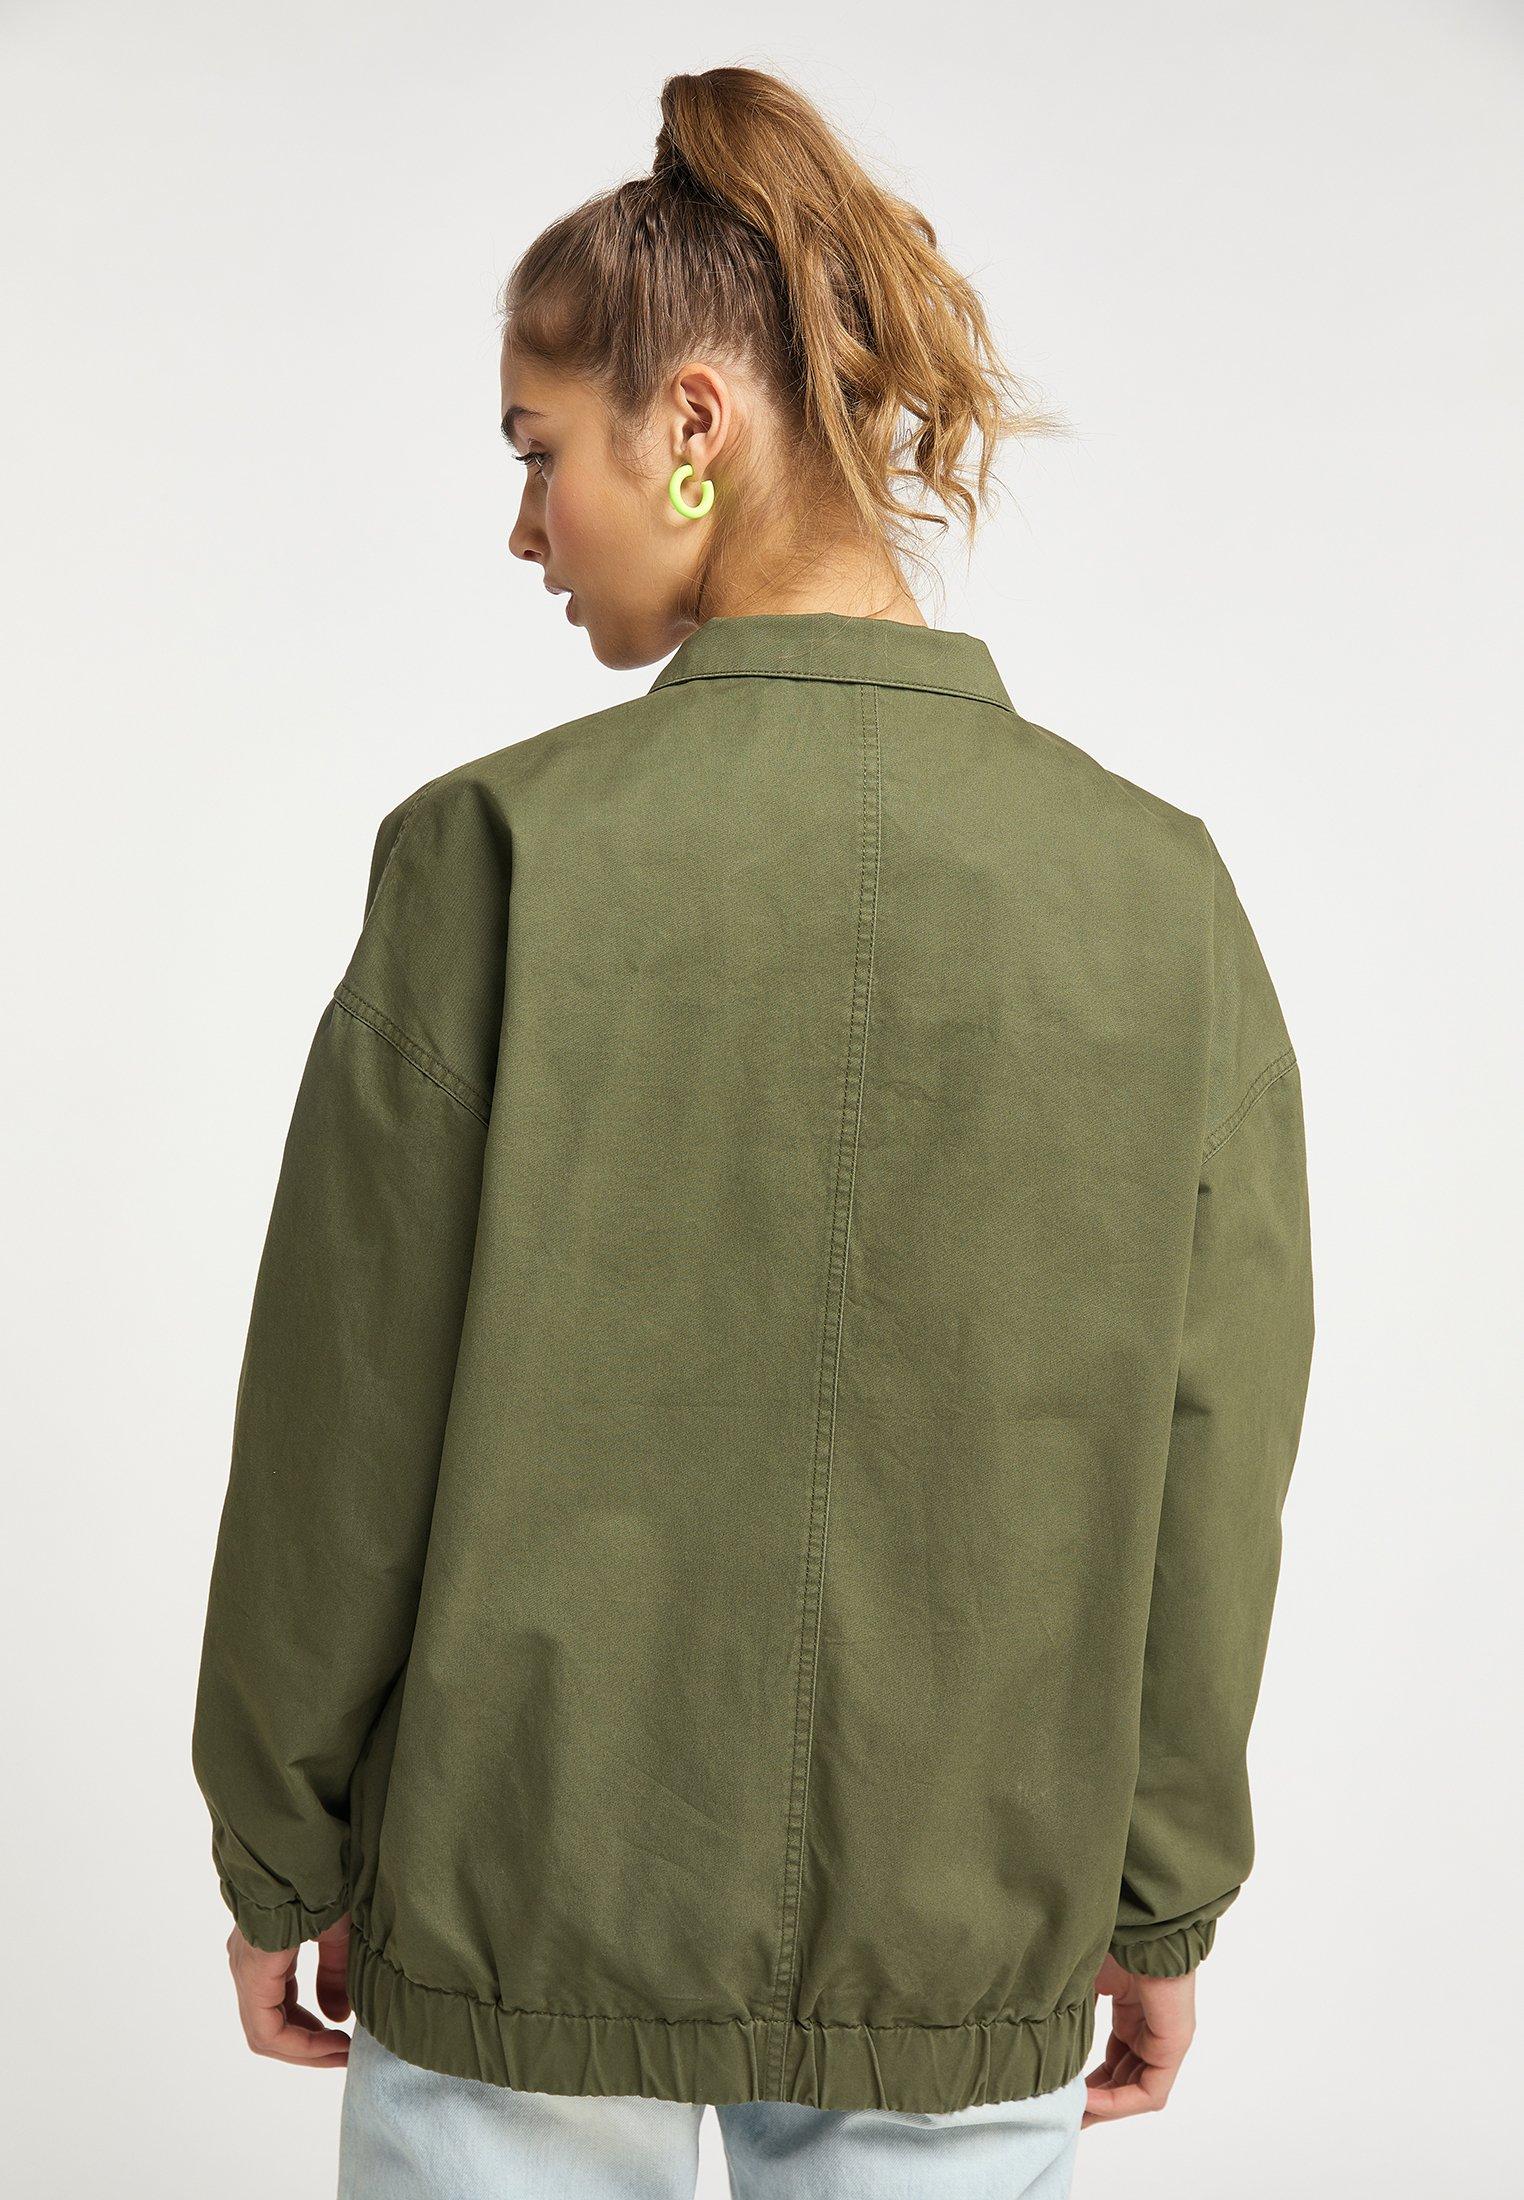 myMo Leichte Jacke military green/dunkelgrün